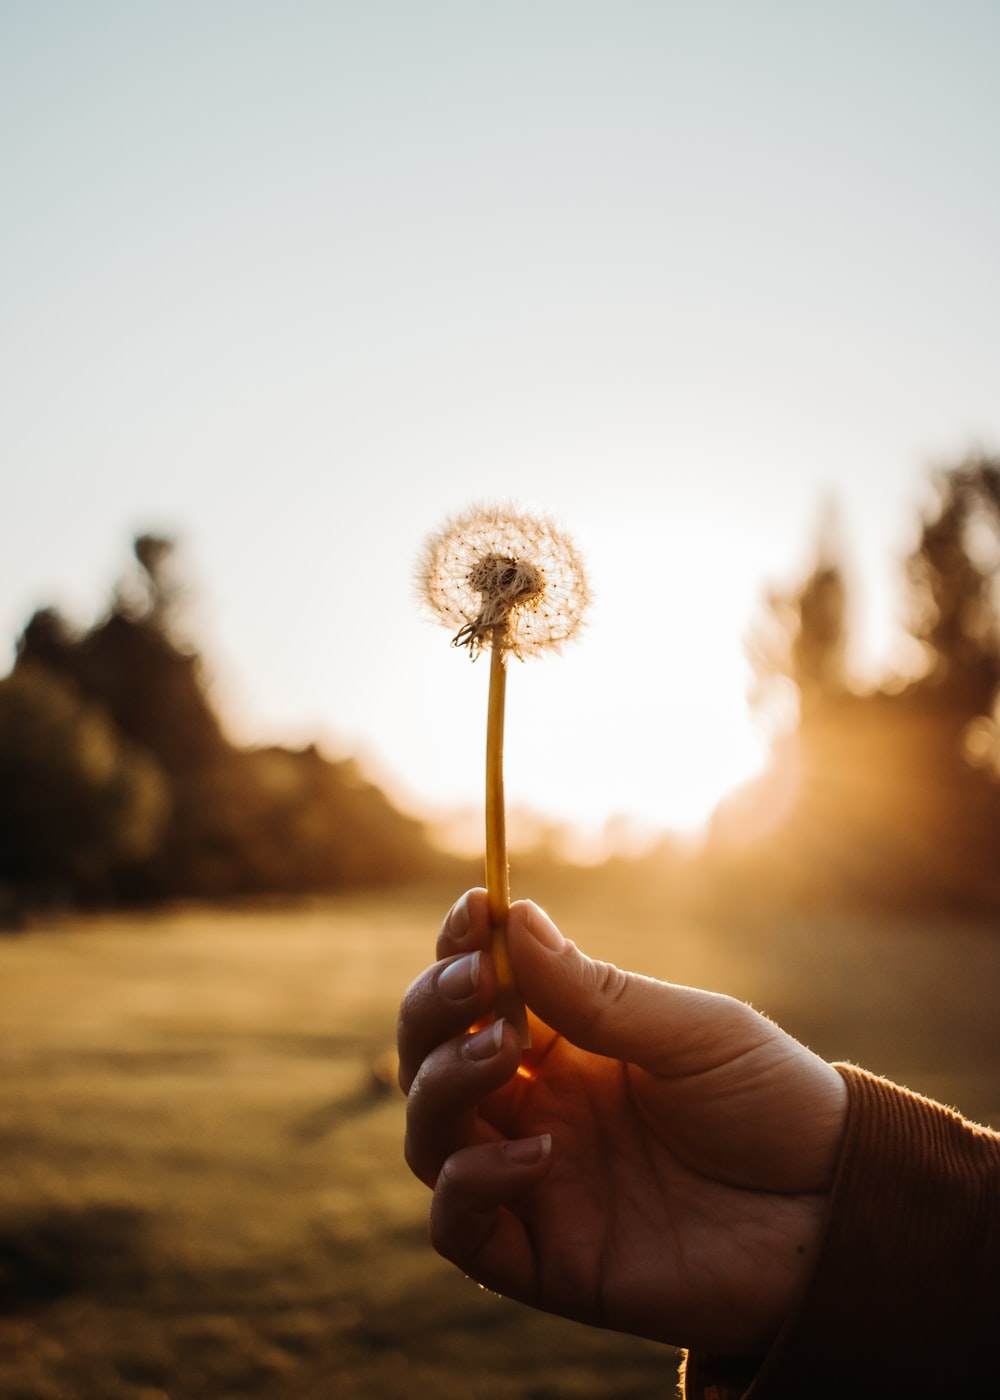 person holding white dandelion flower during daytime